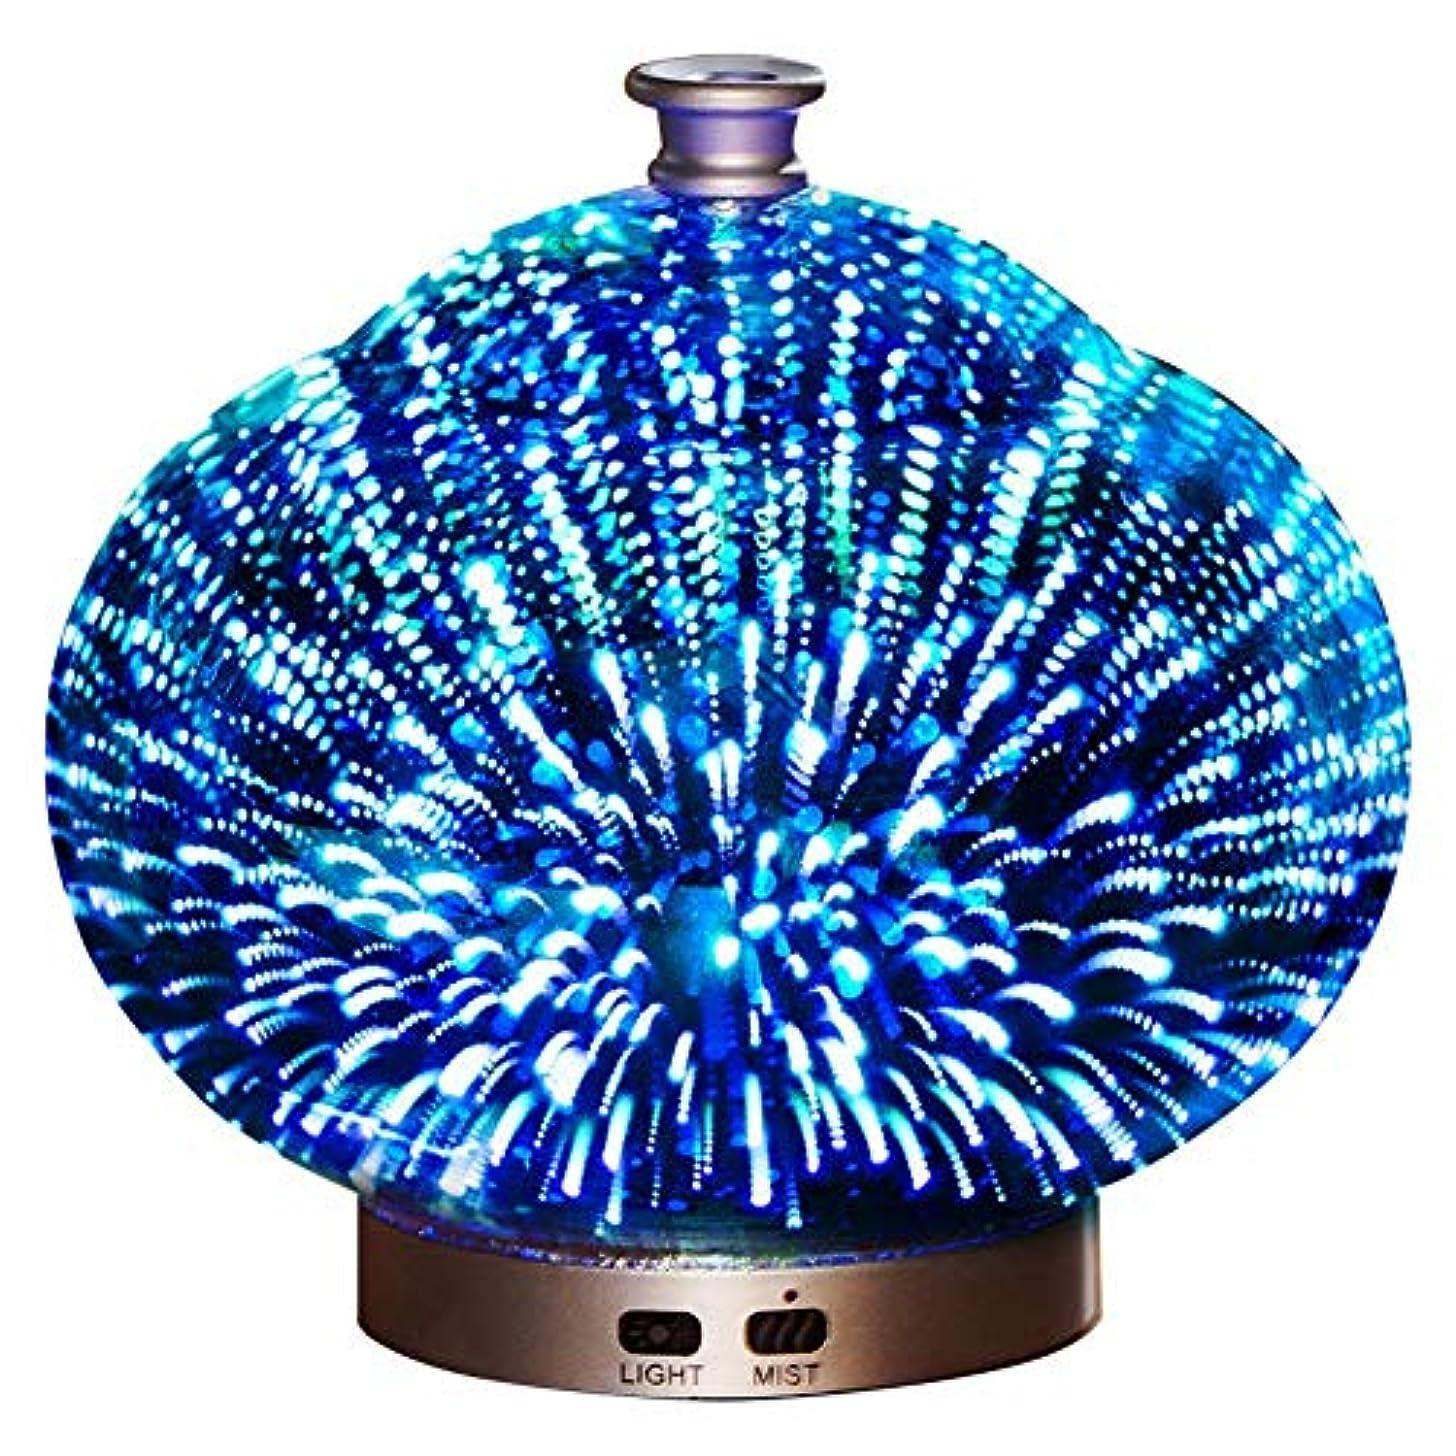 3 D ガラス 精油 ディフューザー, 超音波式 クールミスト アロマディフューザー ホーム ミュート 加湿機 の ベッド オフィス Yoga-a